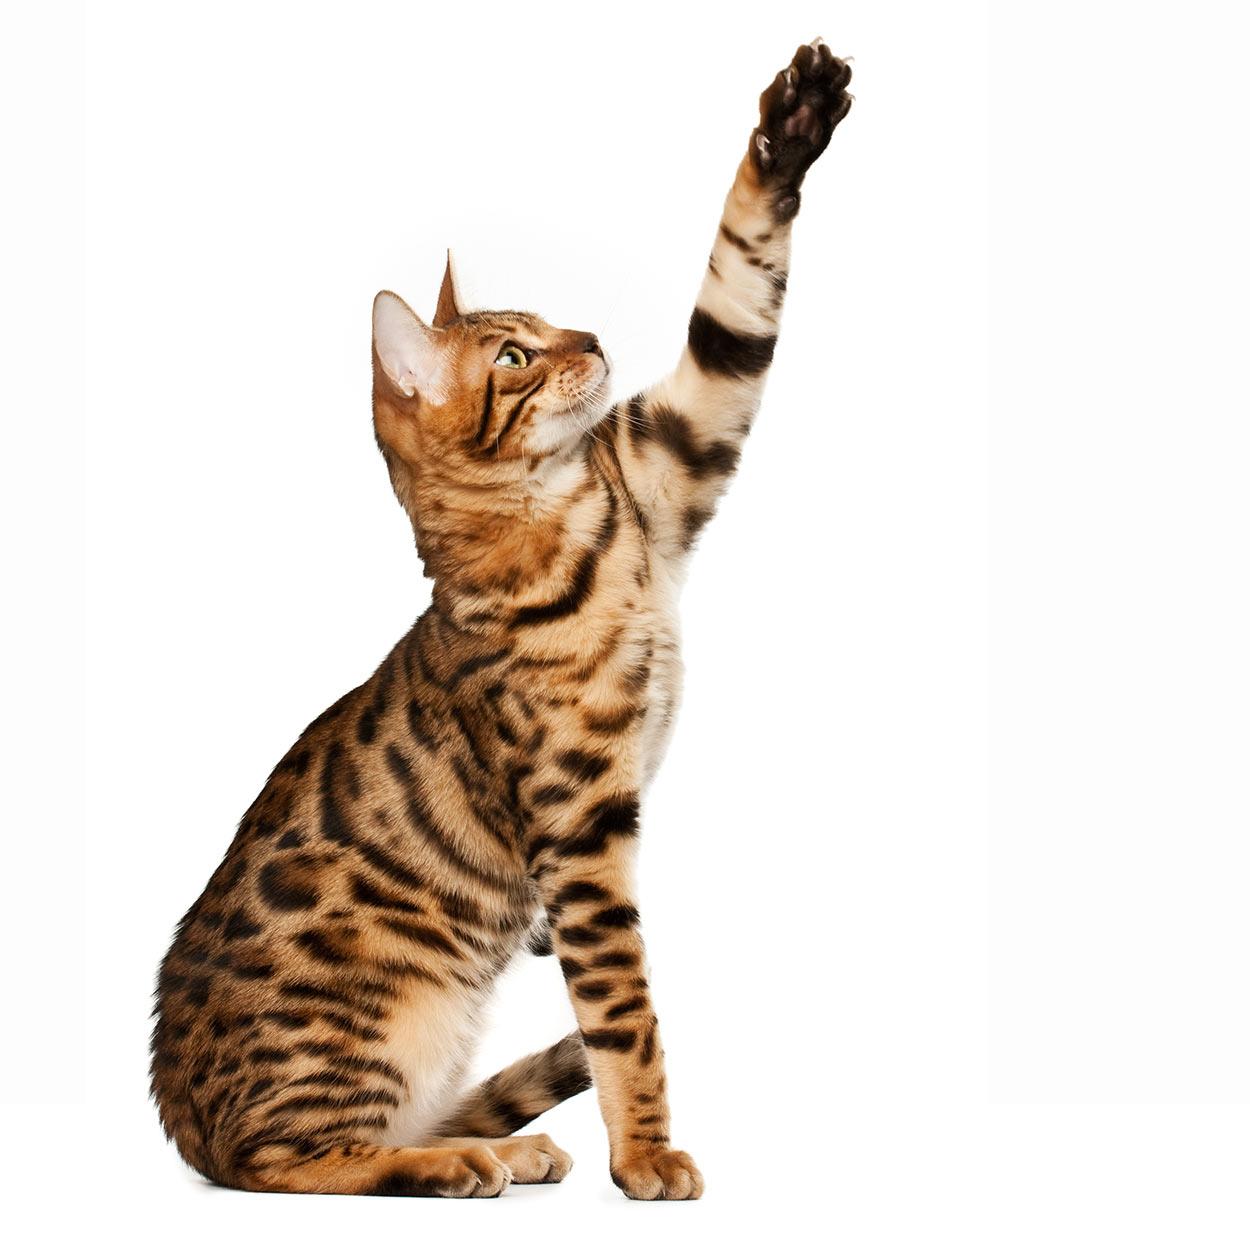 dog-like cat breeds bengal